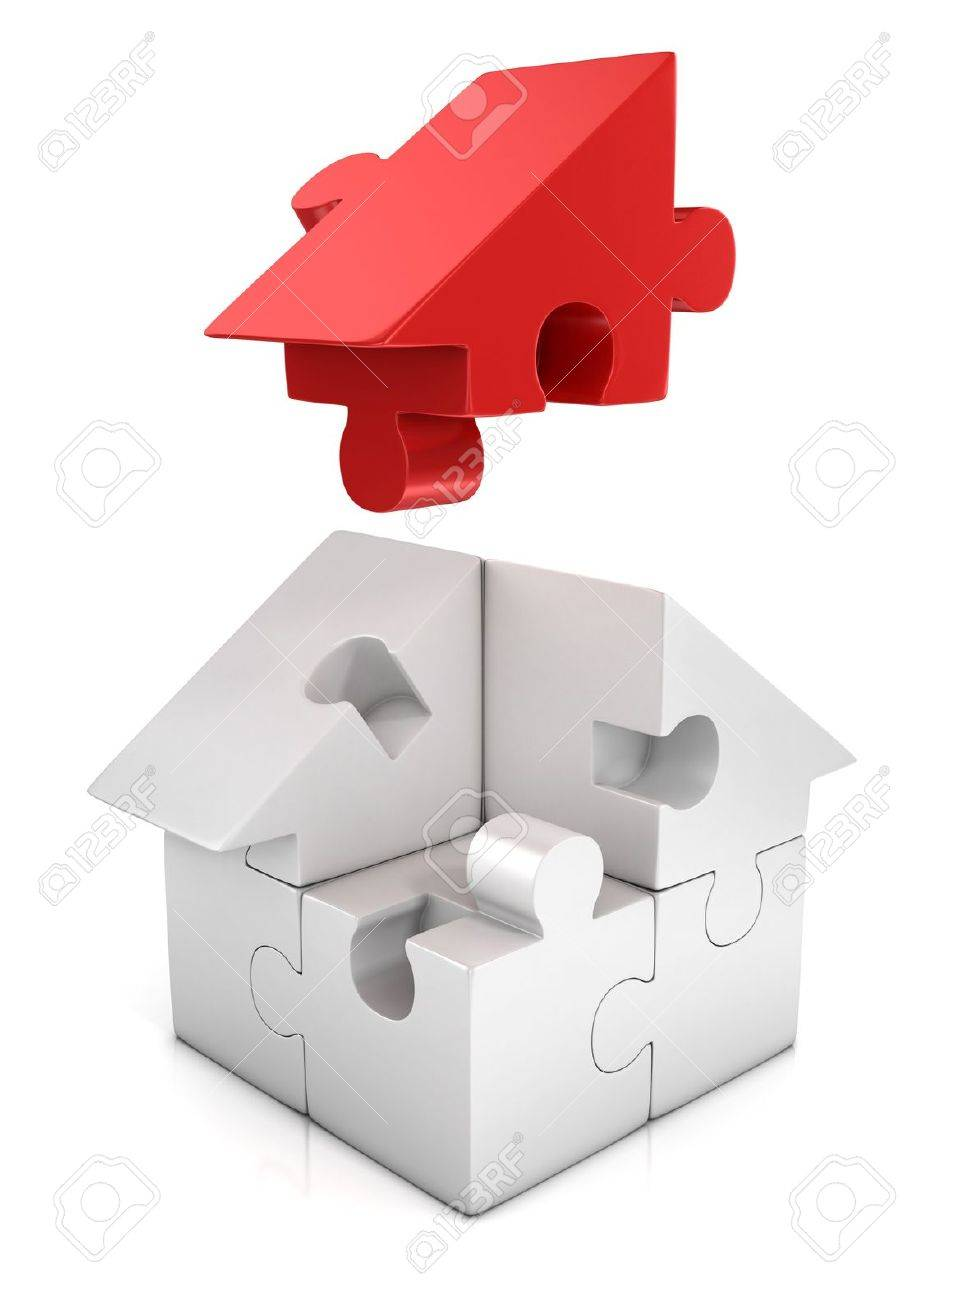 jigsaw house 3d illustration Stock Photo - 19776002